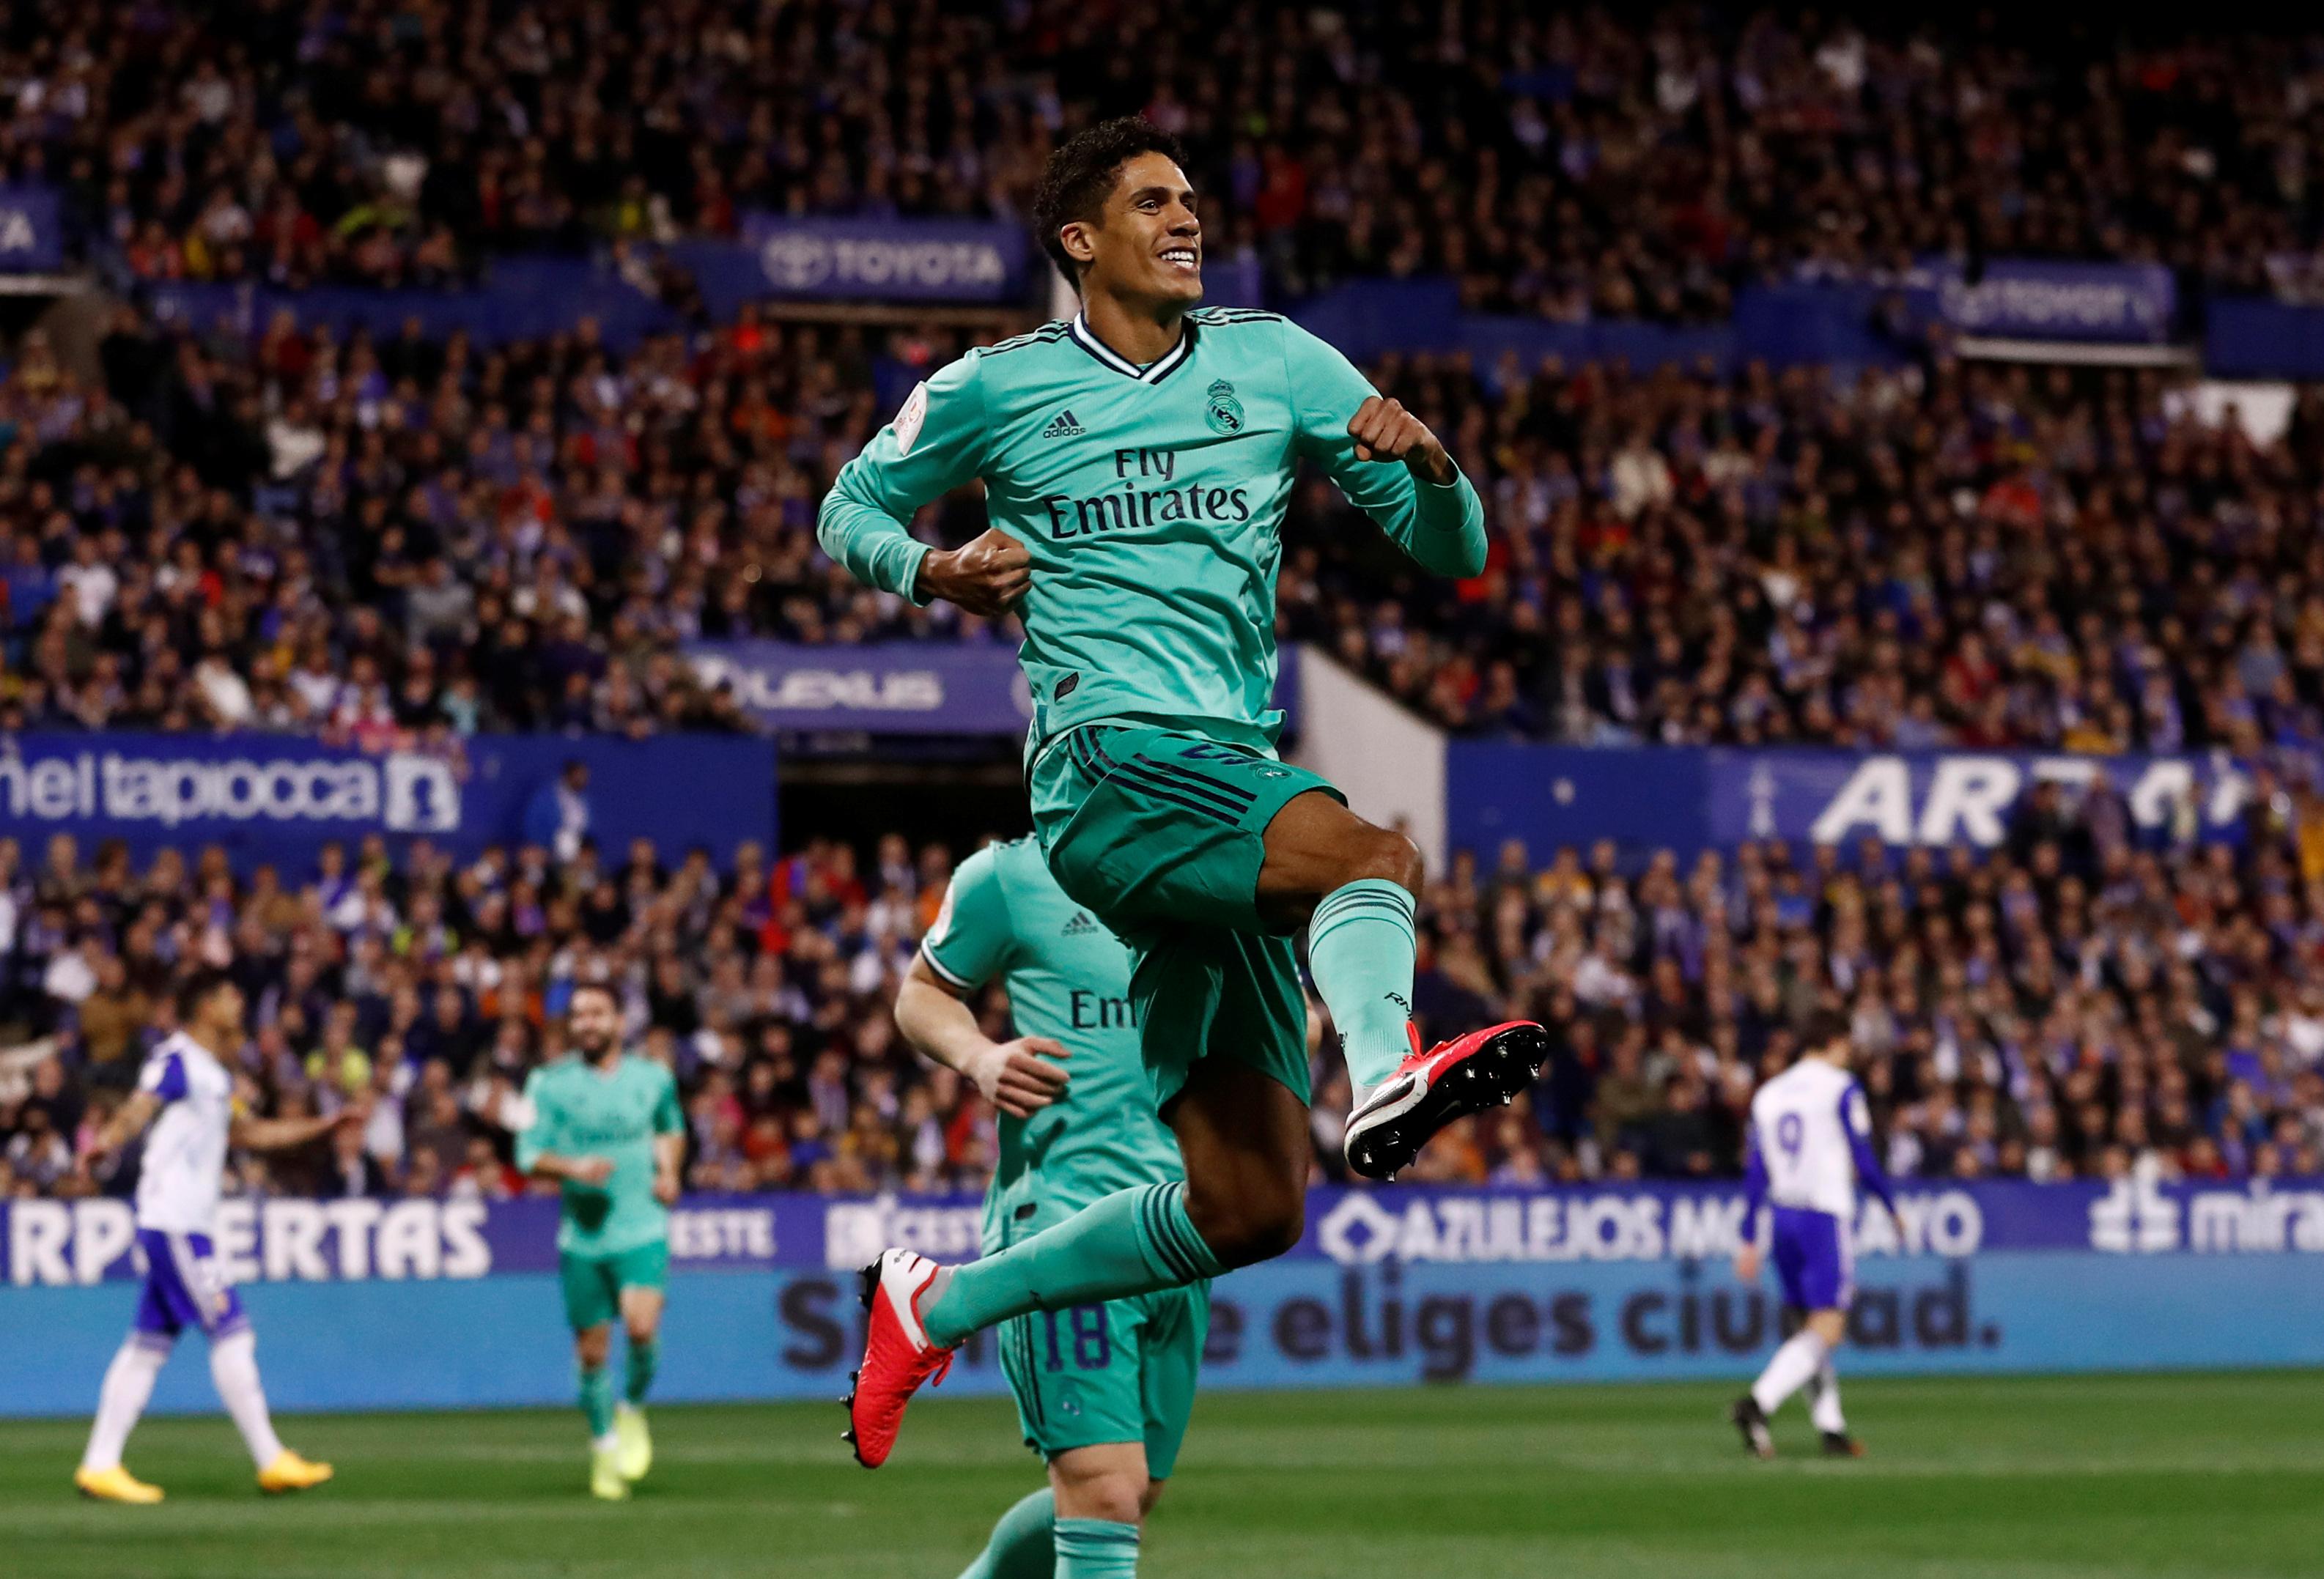 Football - Etranger - Varane fête ses 27 ans : ses plus beaux buts avec le Real Madrid